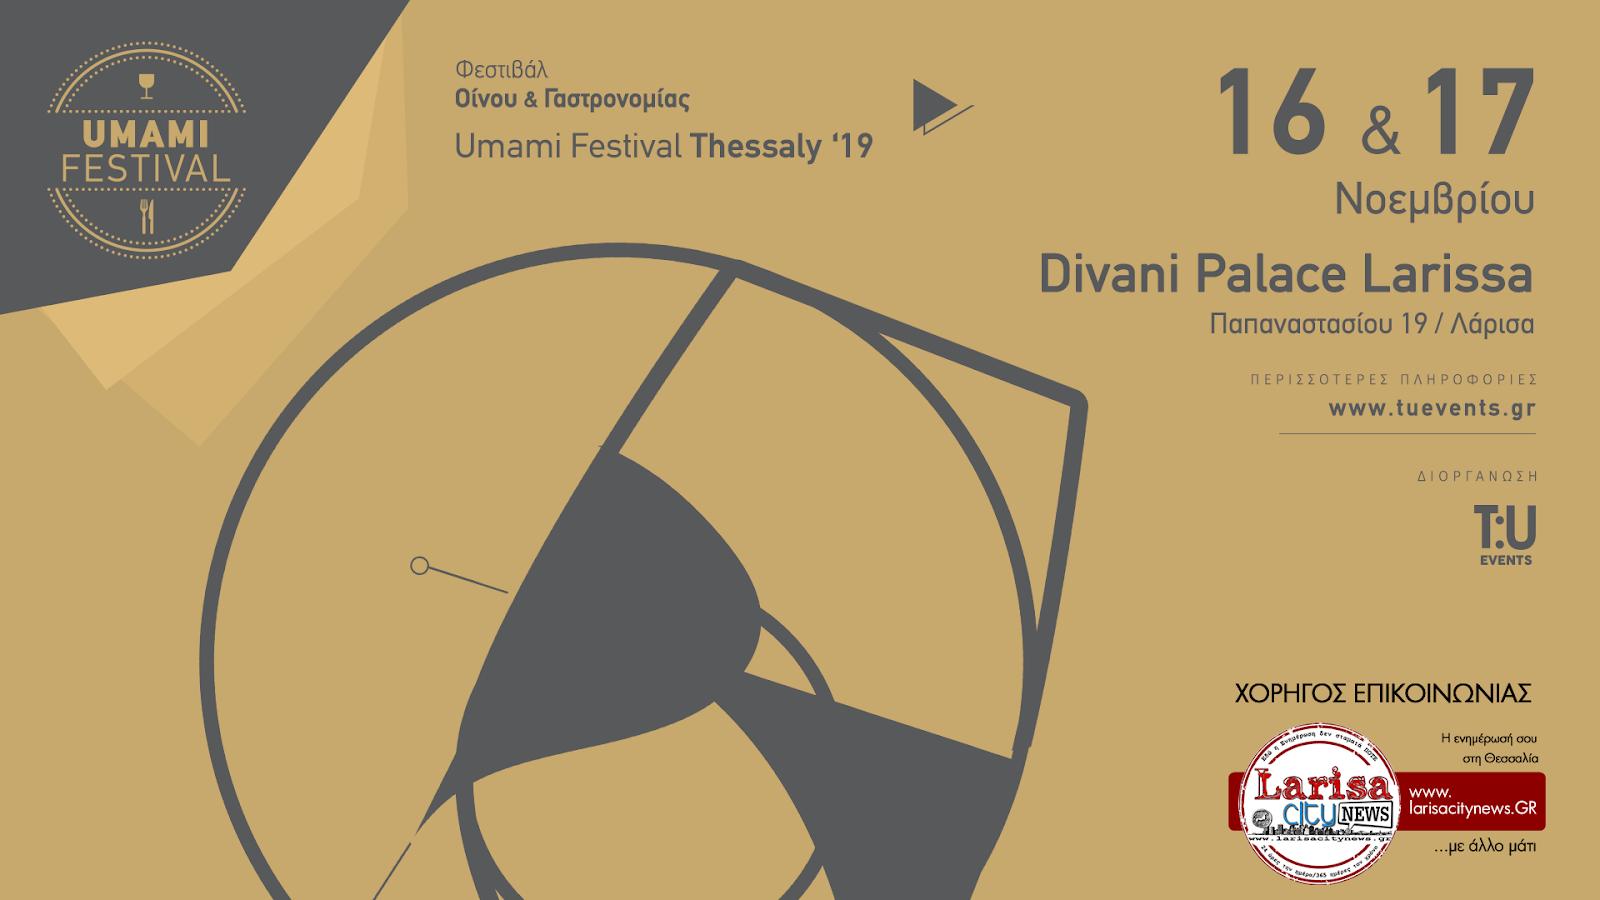 Tο Umami Festival Thessaly '19 επιστρέφει στη Λάρισα! (ΦΩΤΟ-VIDEO)